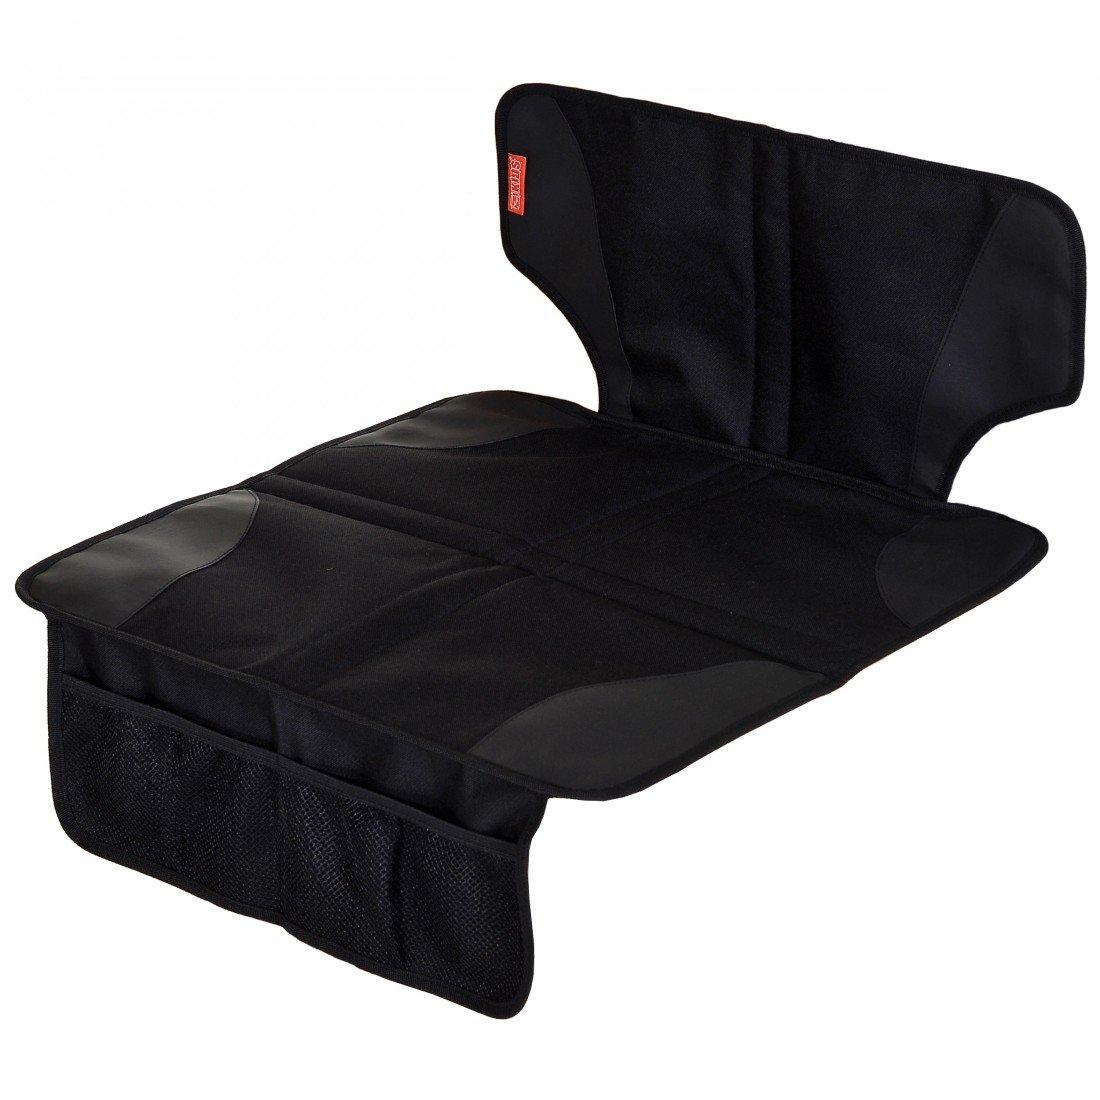 LCP Kids Autositzschoner Unterlage Isofix Kindersitz Rücksitzbank Schutzauflage 538